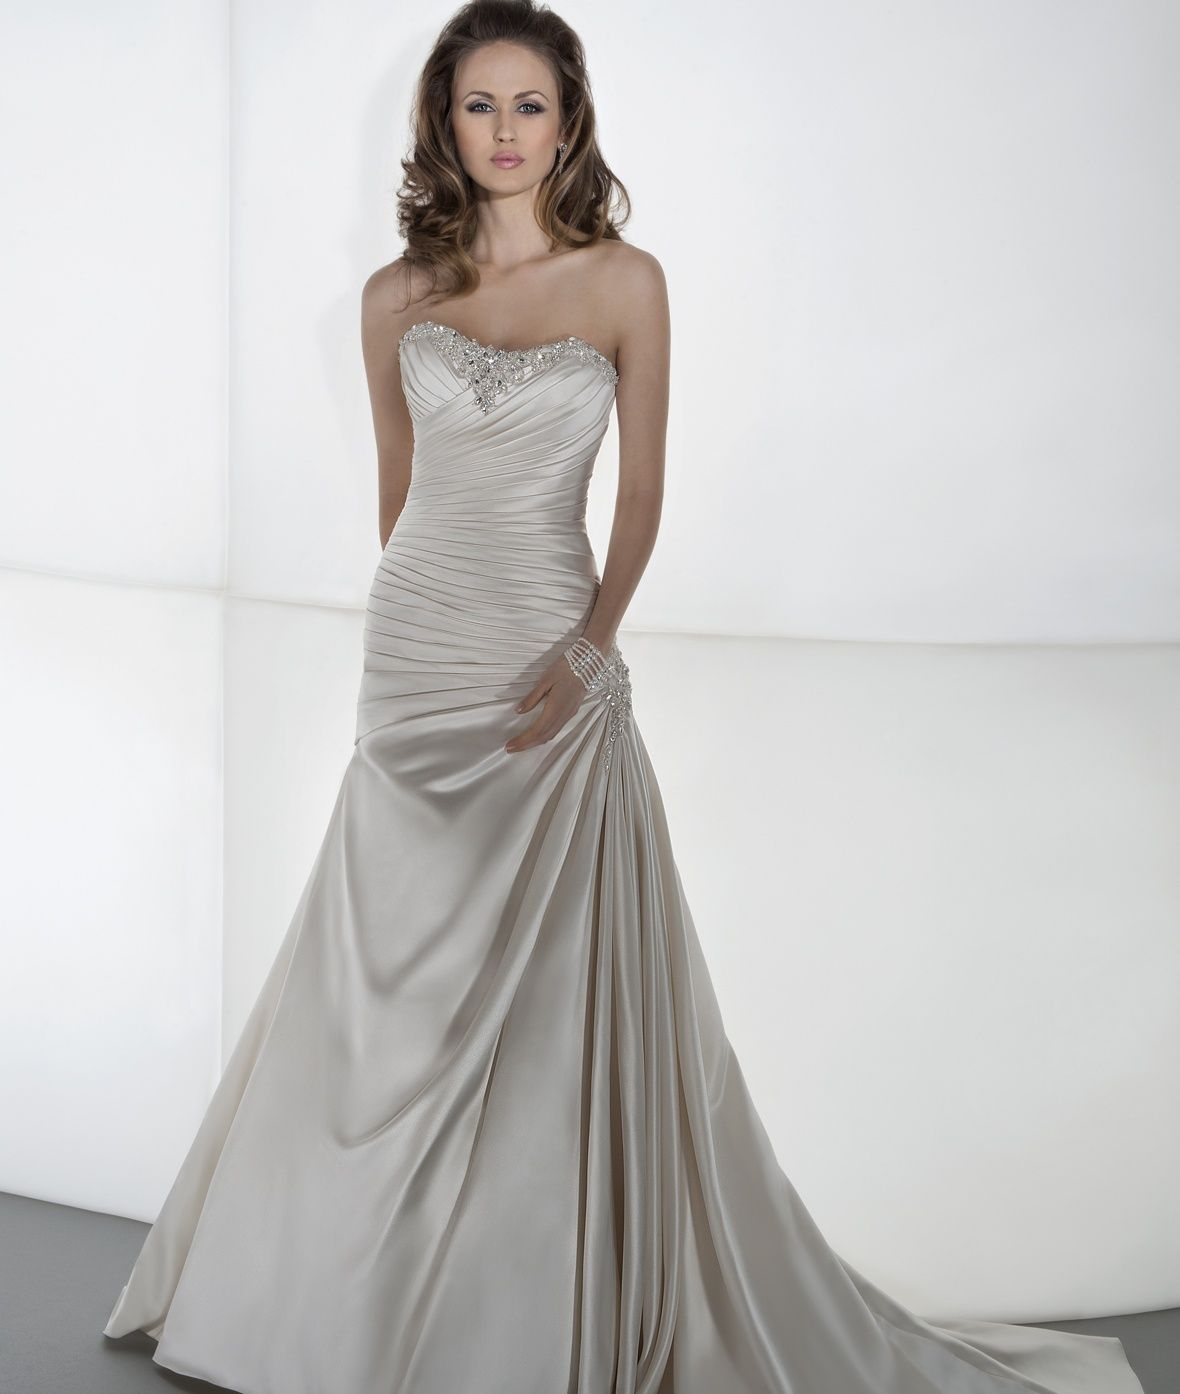 Demetrios White Drop Waist Ballgown With Beaded Bodice: Sposabella Style 4304 By Demetrios